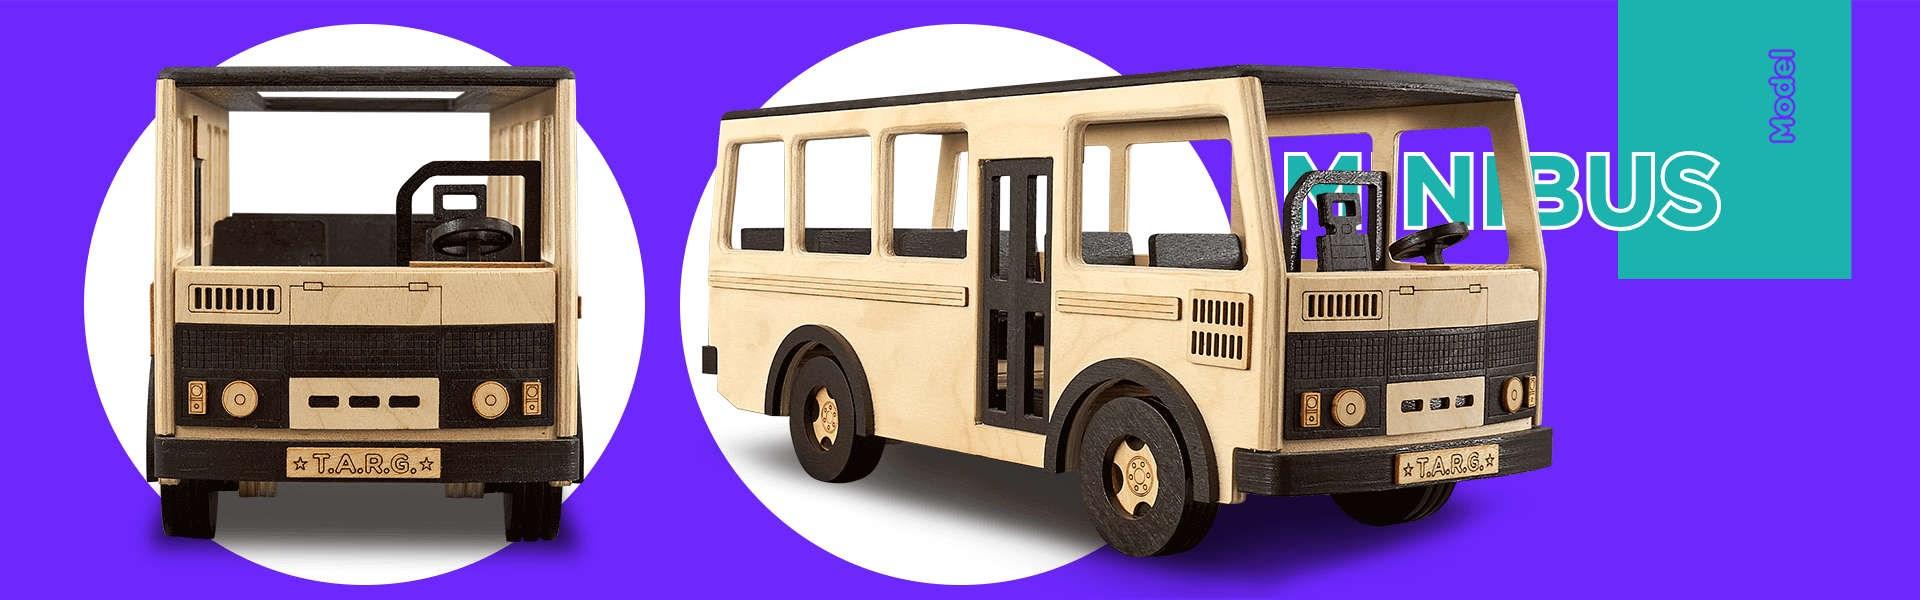 Сборная модель T.A.R.G. Minibus - фото 4959